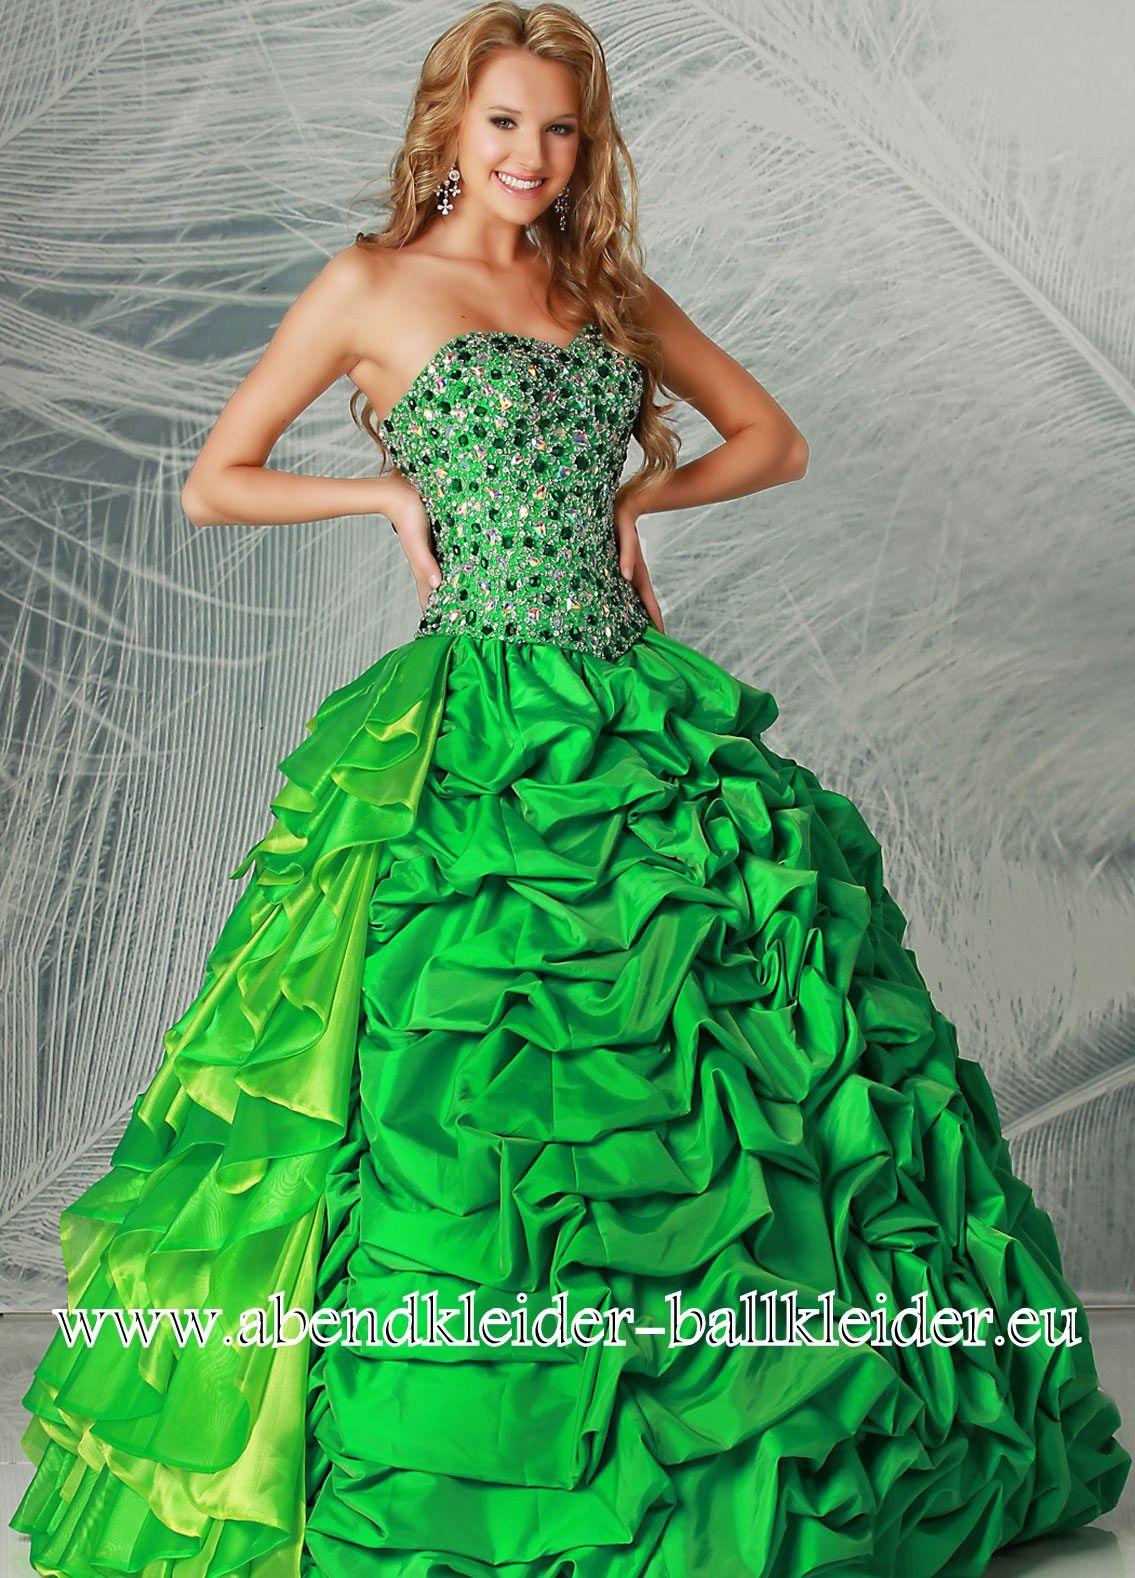 Grünes Abendkleid Ballkleid Online  Ballkleid, Abendkleid grün